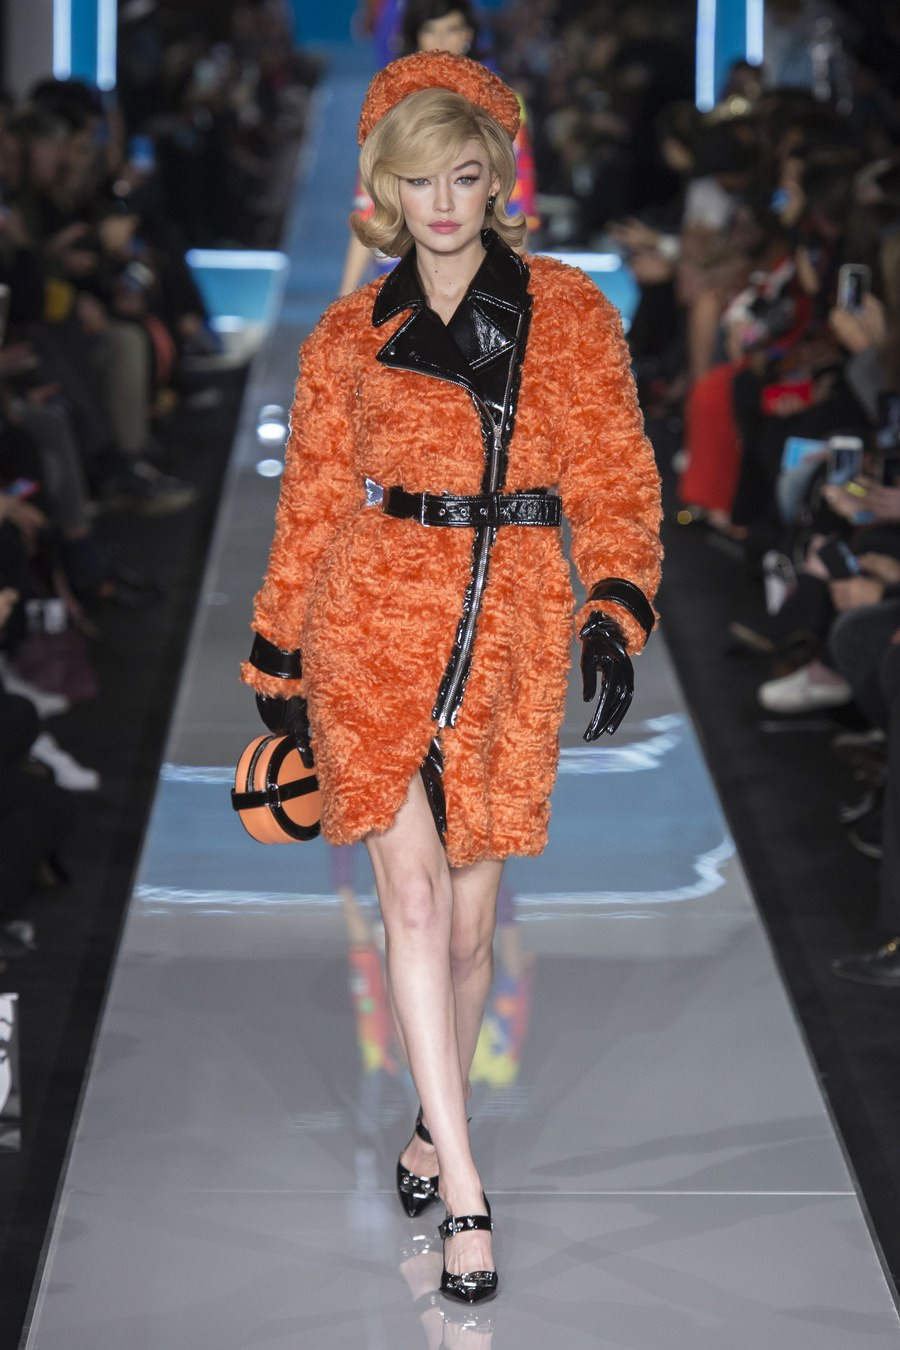 Moschino Milan Fashion Week 2018 Gigi Hadid